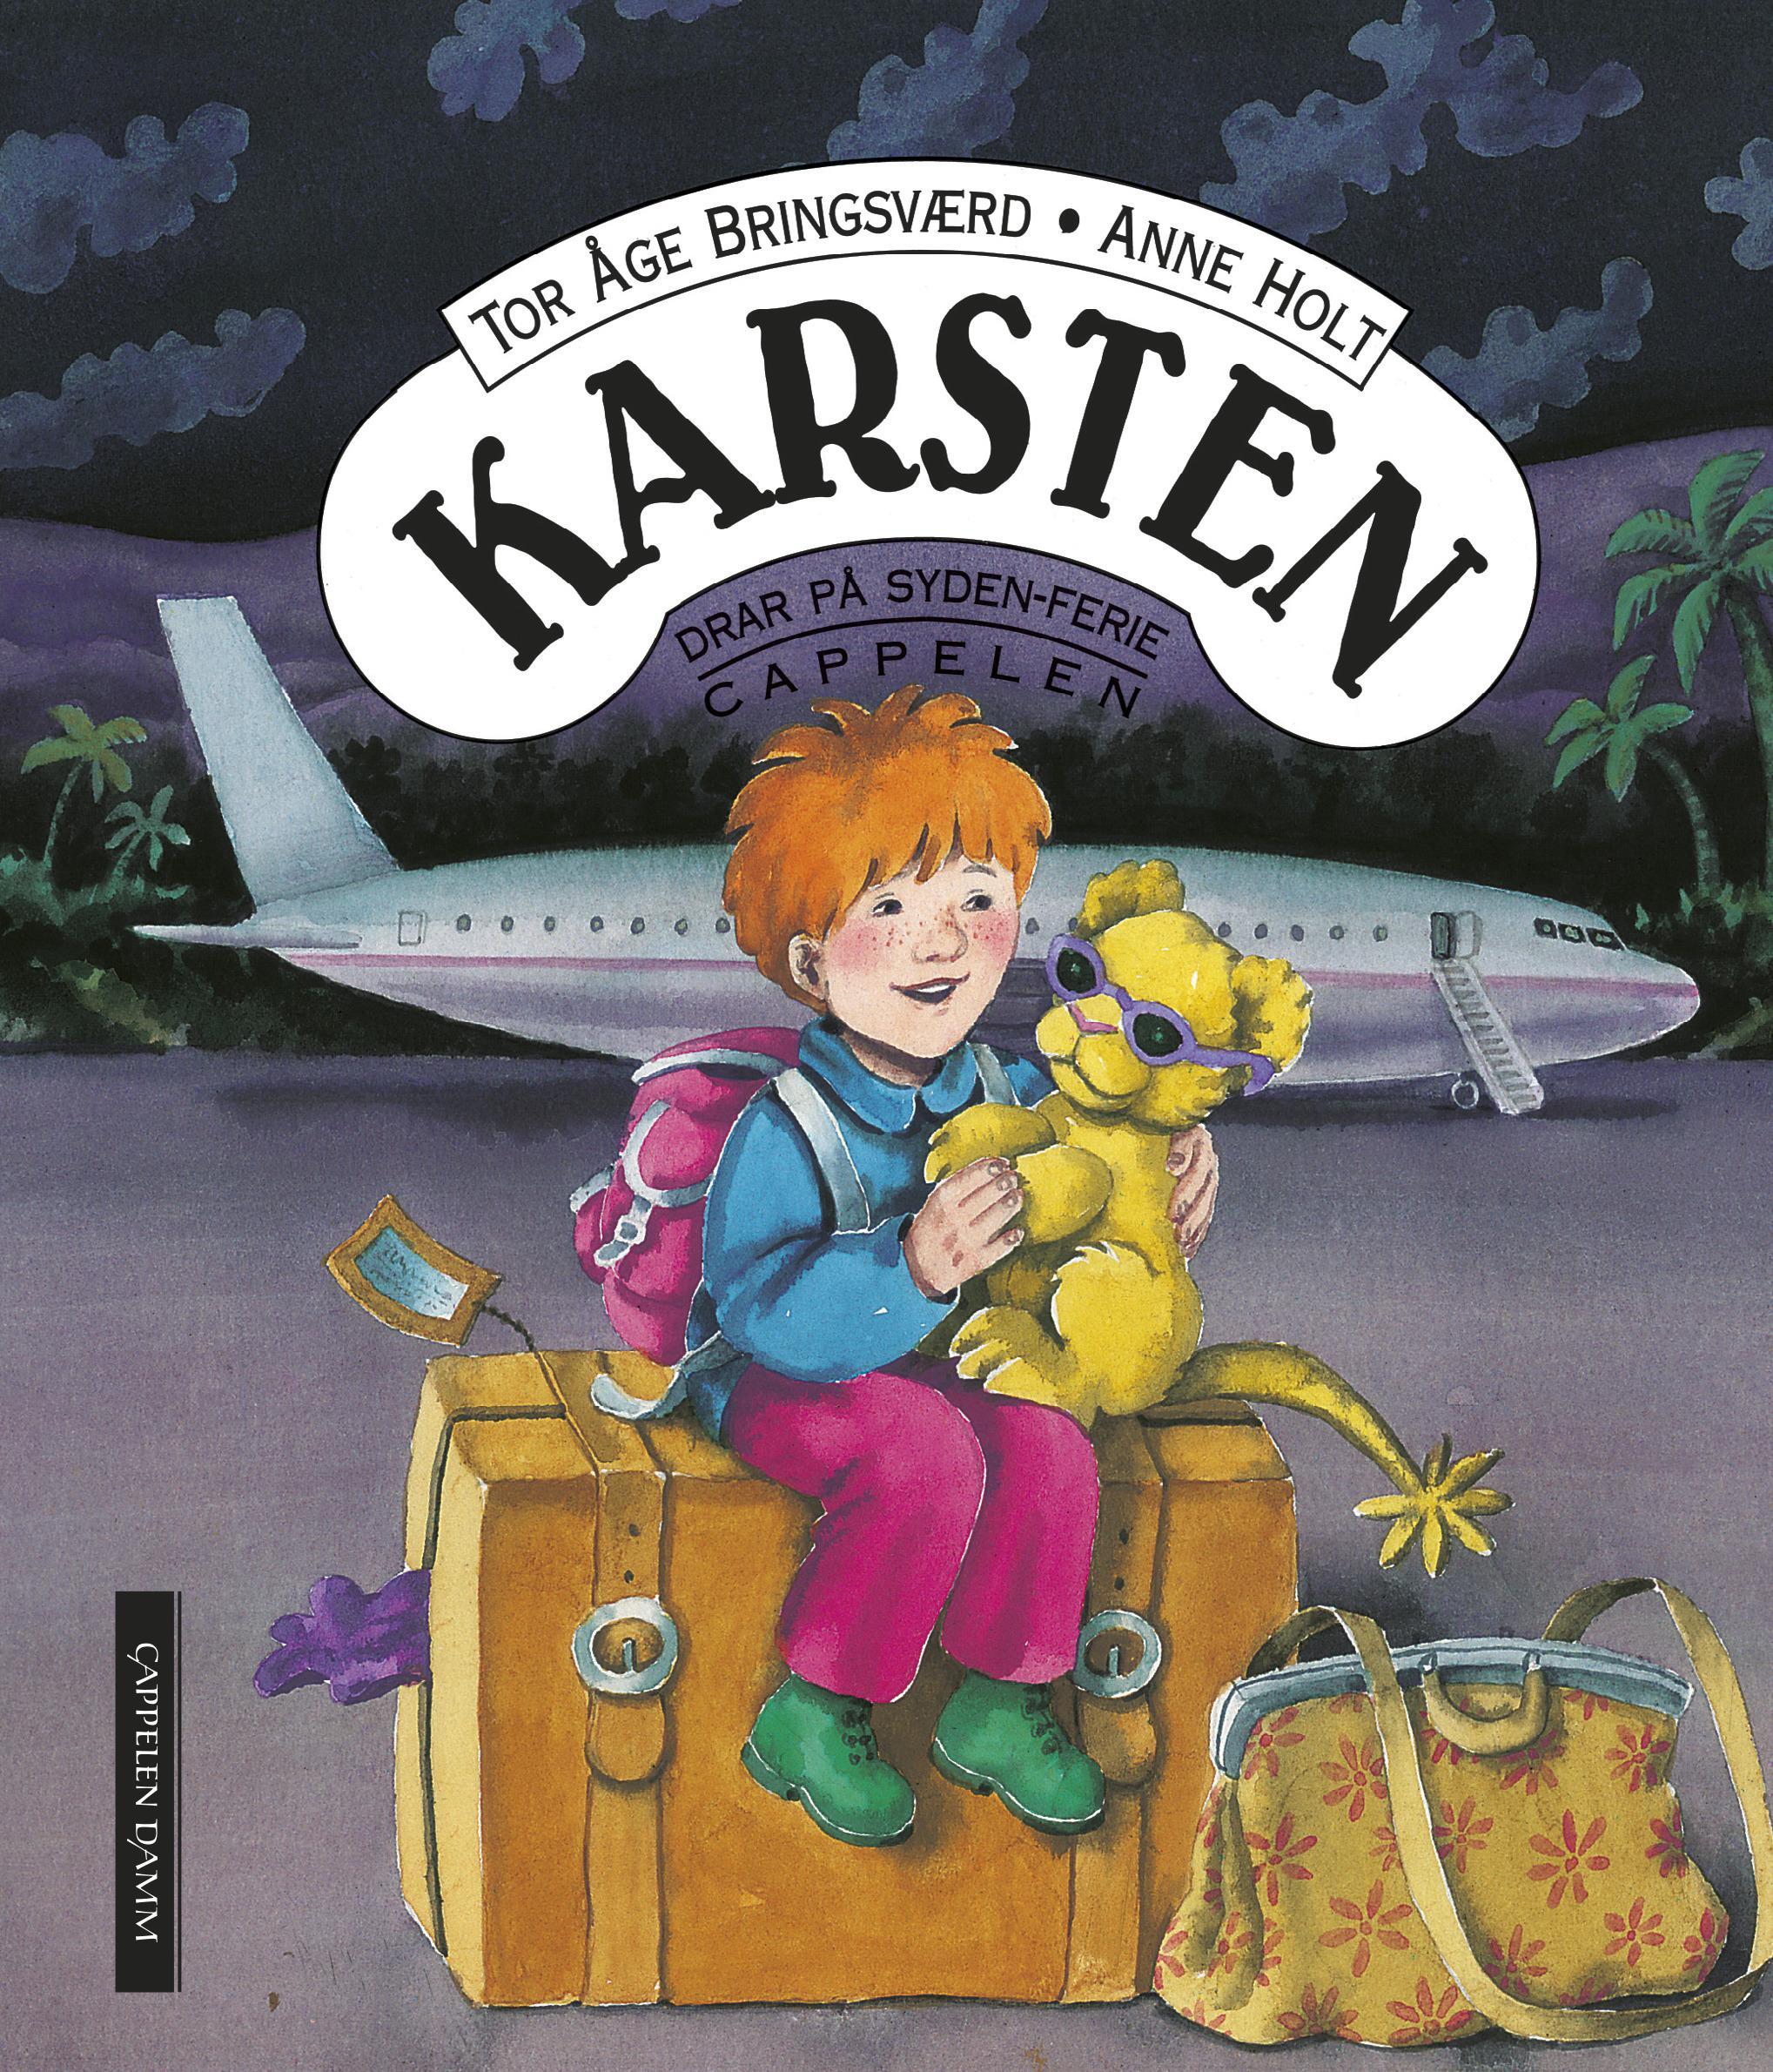 """Karsten drar på sydenferie"" av Tor Åge Bringsværd"